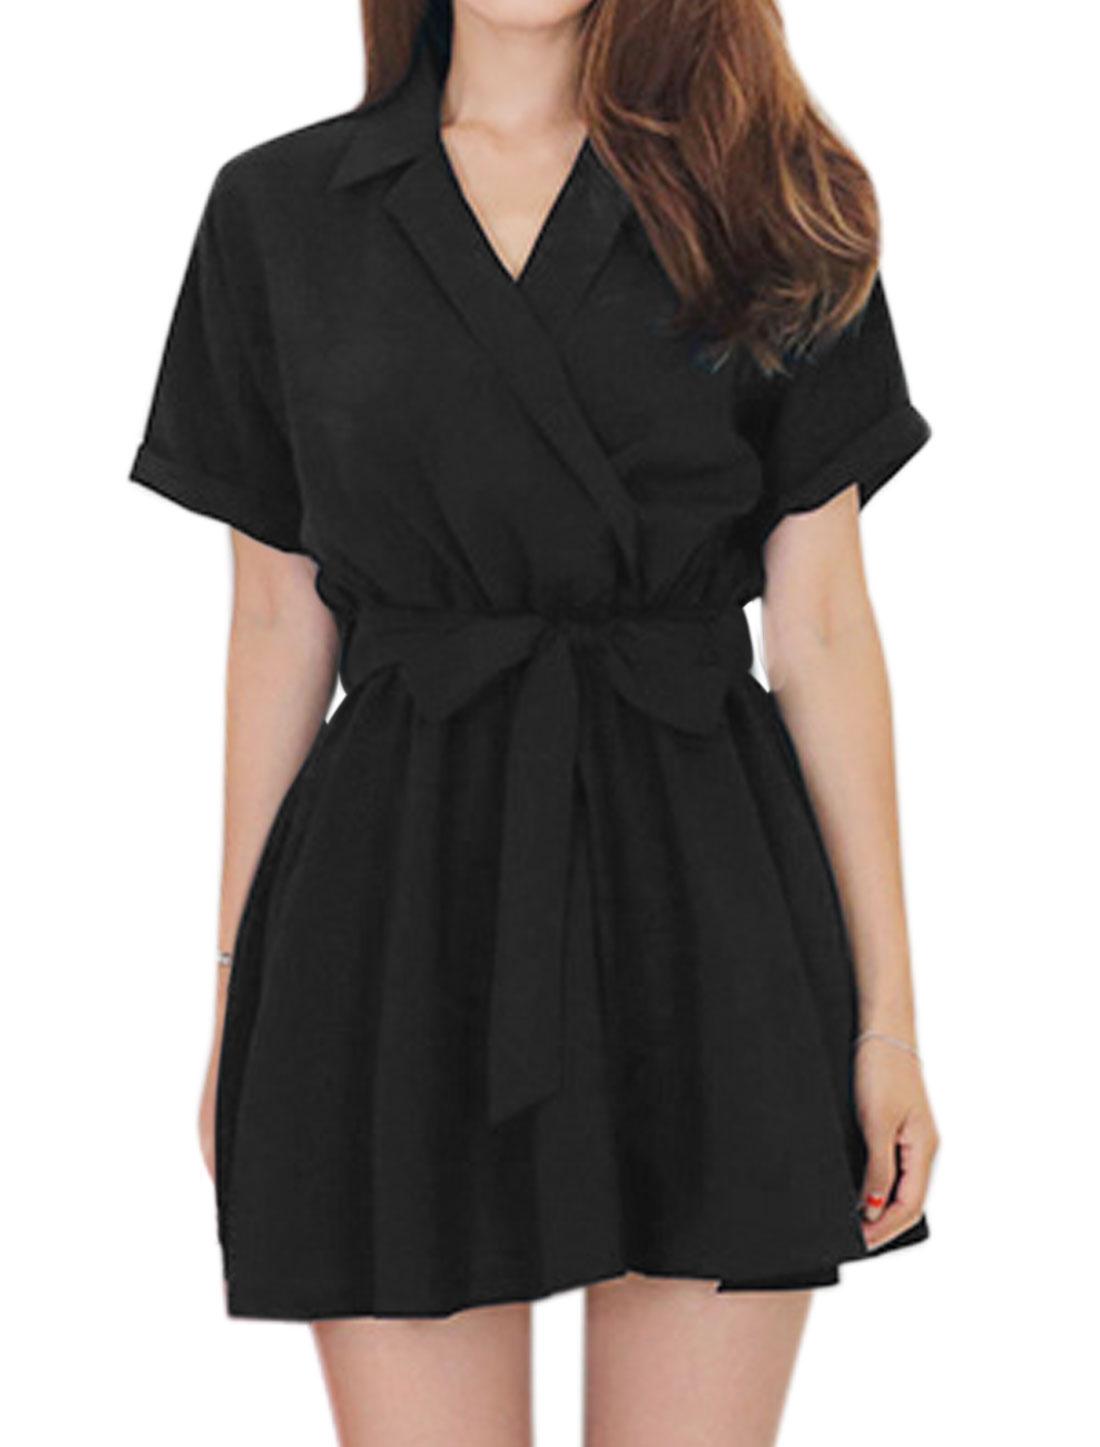 Women Turn Down Collar Elastic Waist Tunic Dress w Belt Black S